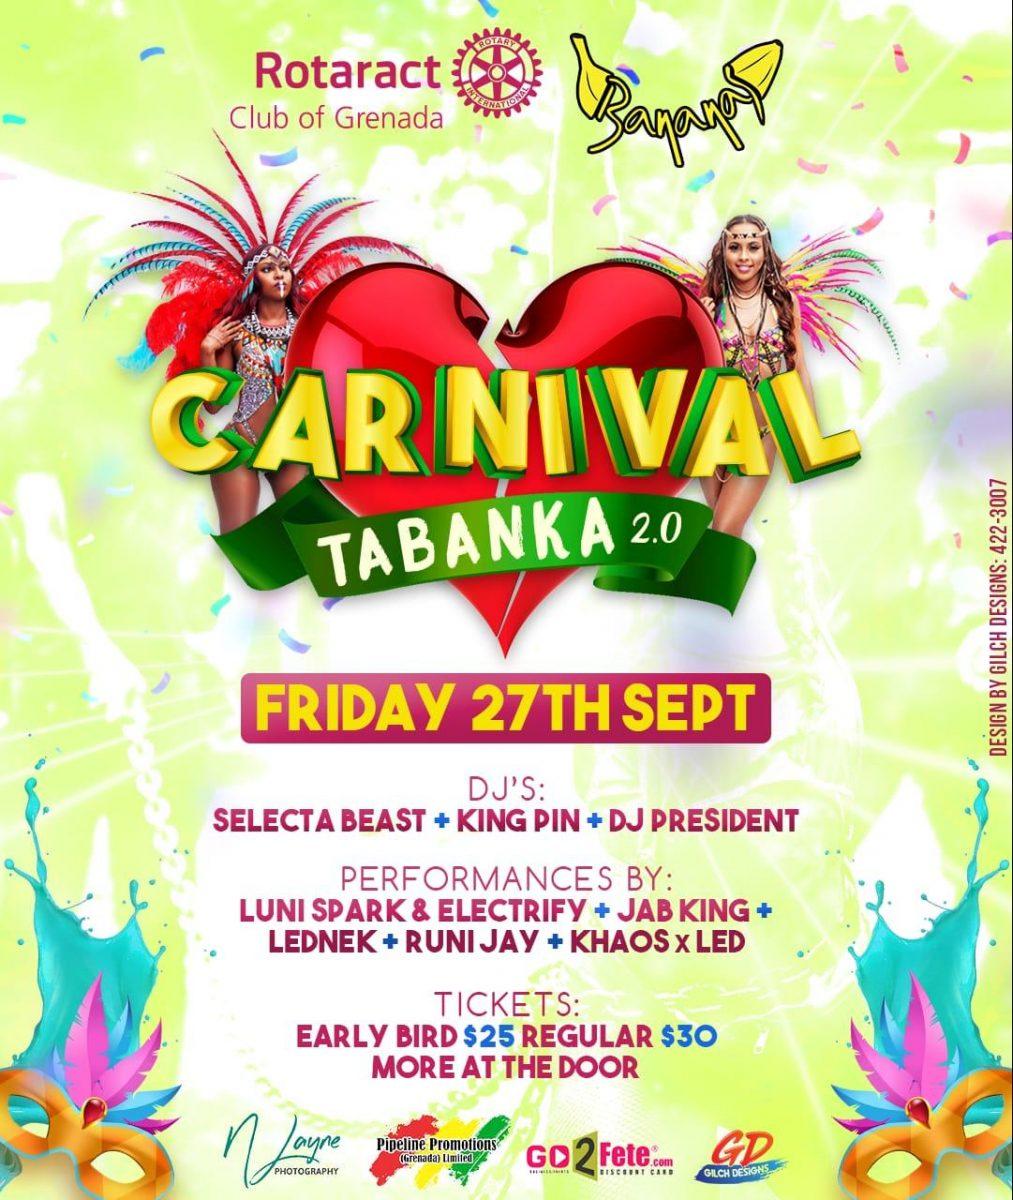 Carnival Tabanka 2.0